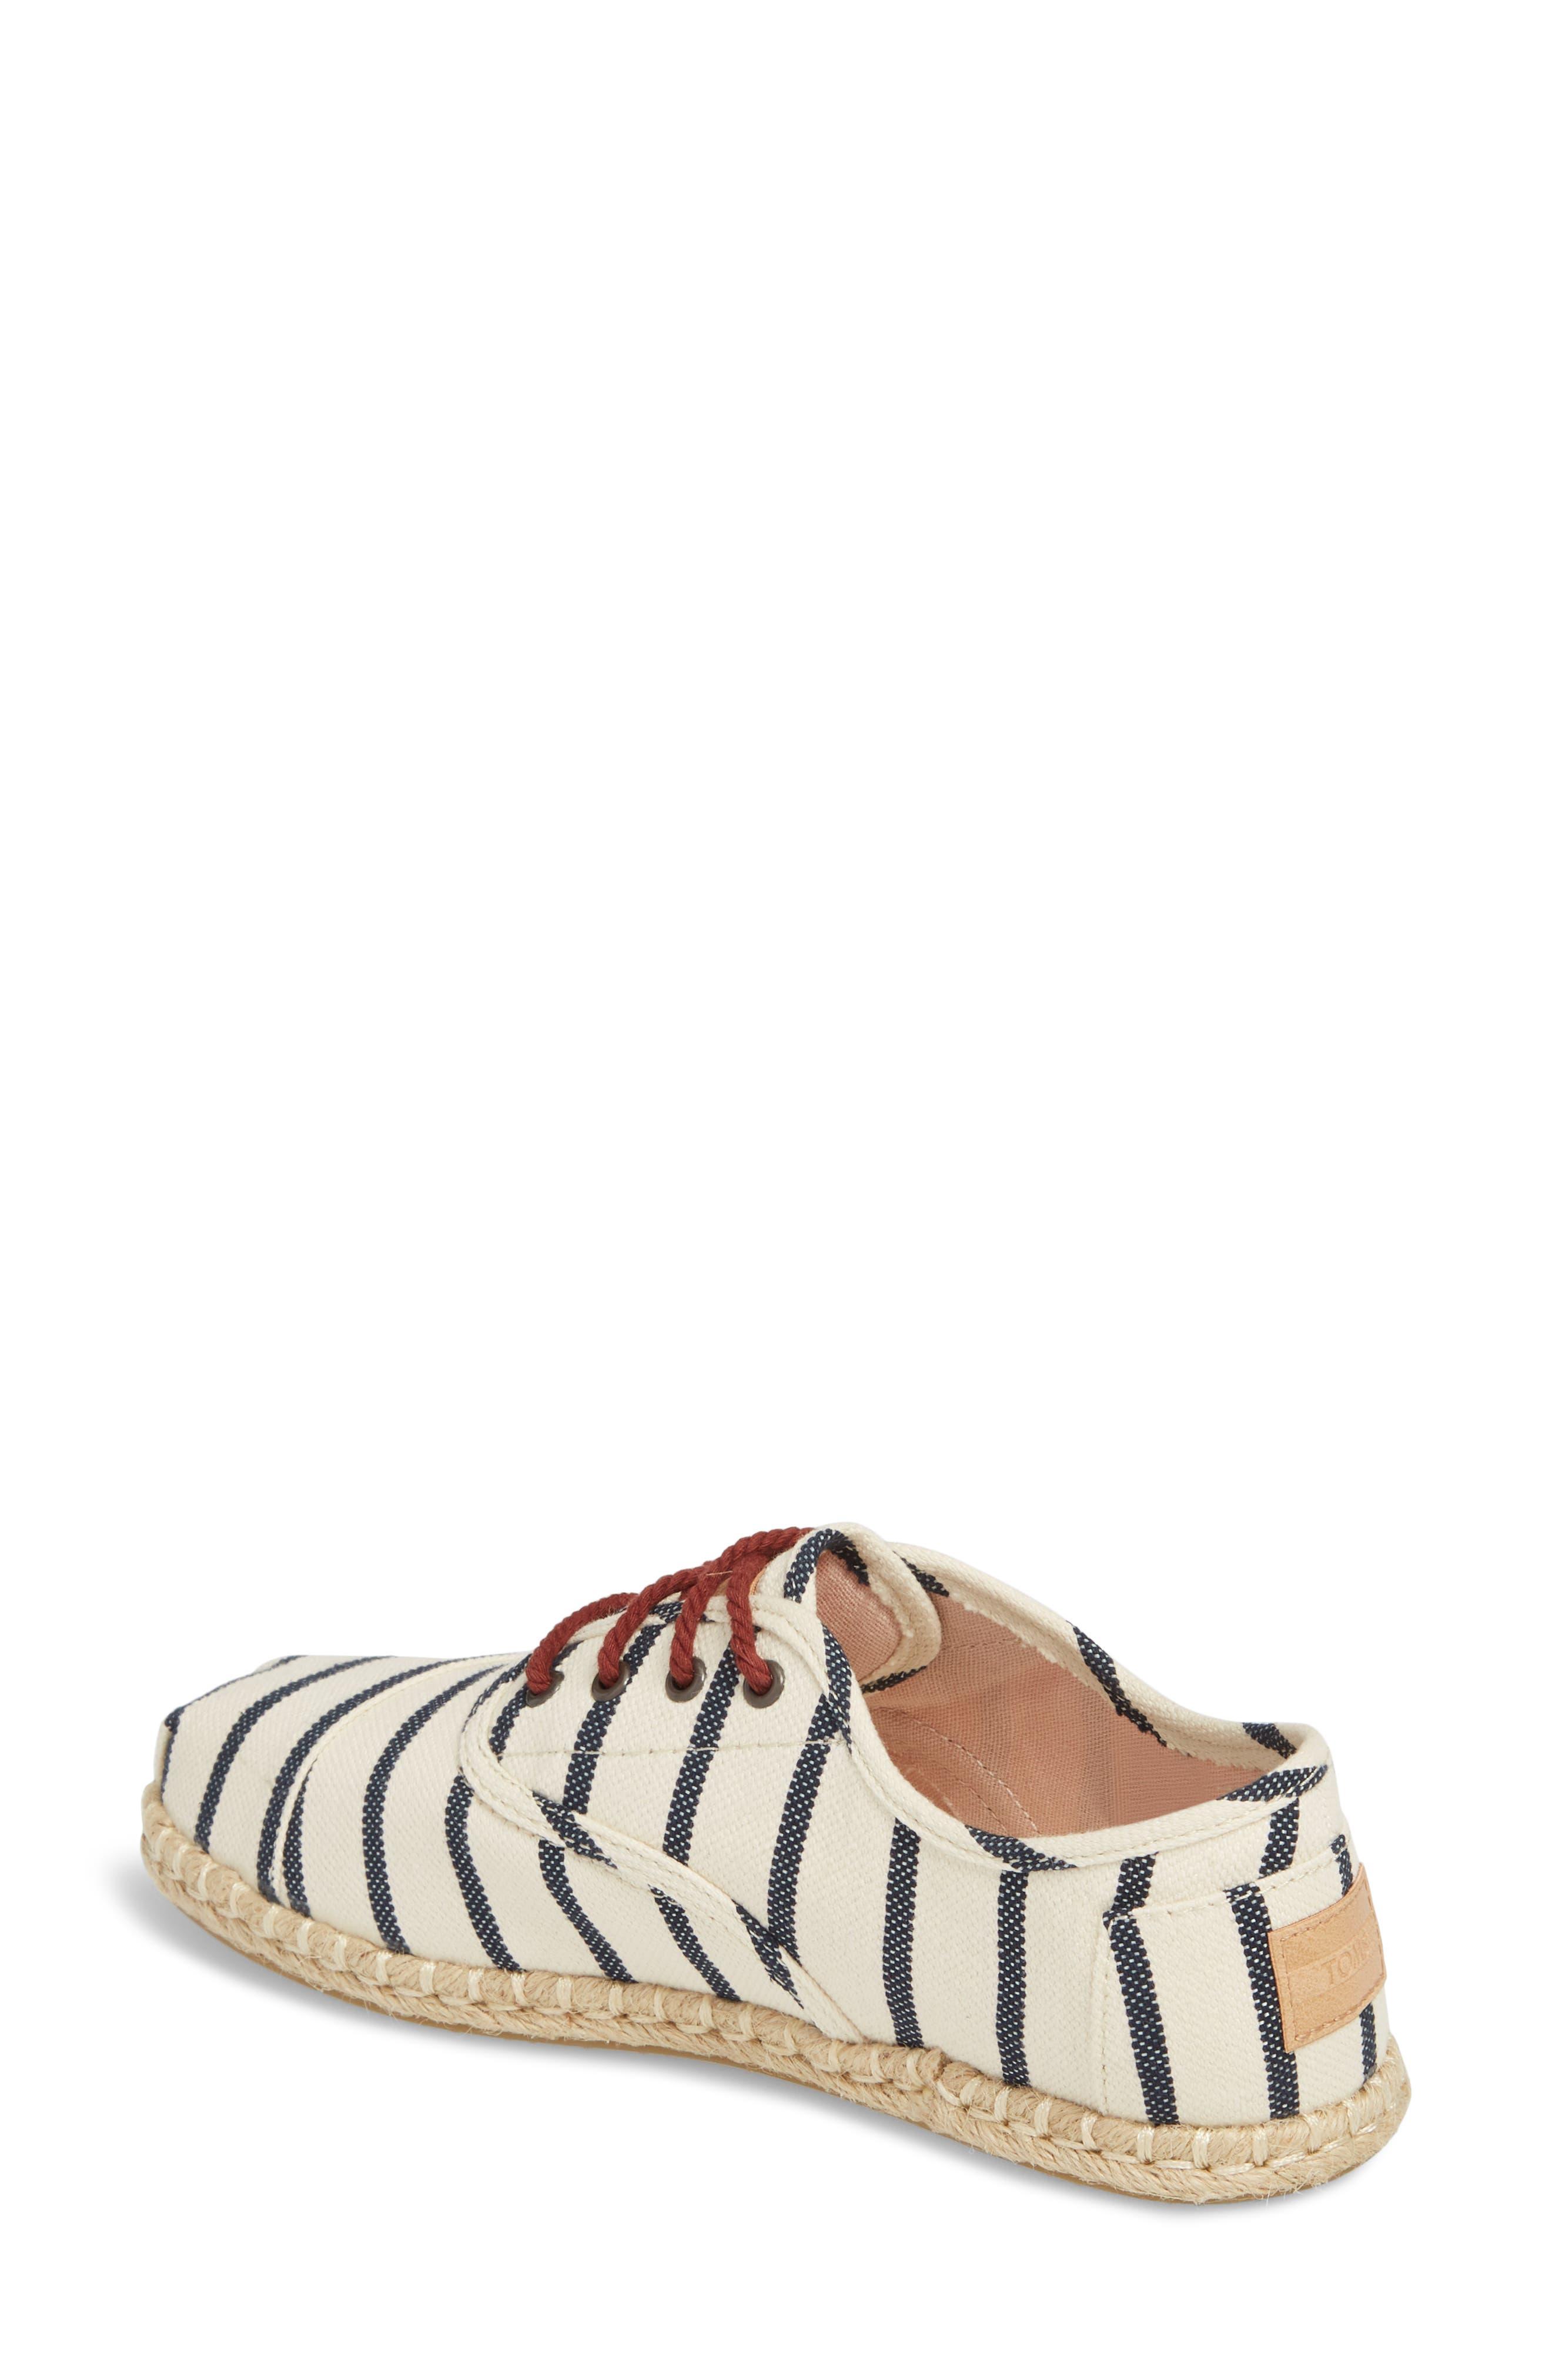 Cordones Sneaker,                             Alternate thumbnail 2, color,                             Natural Stripe Woven